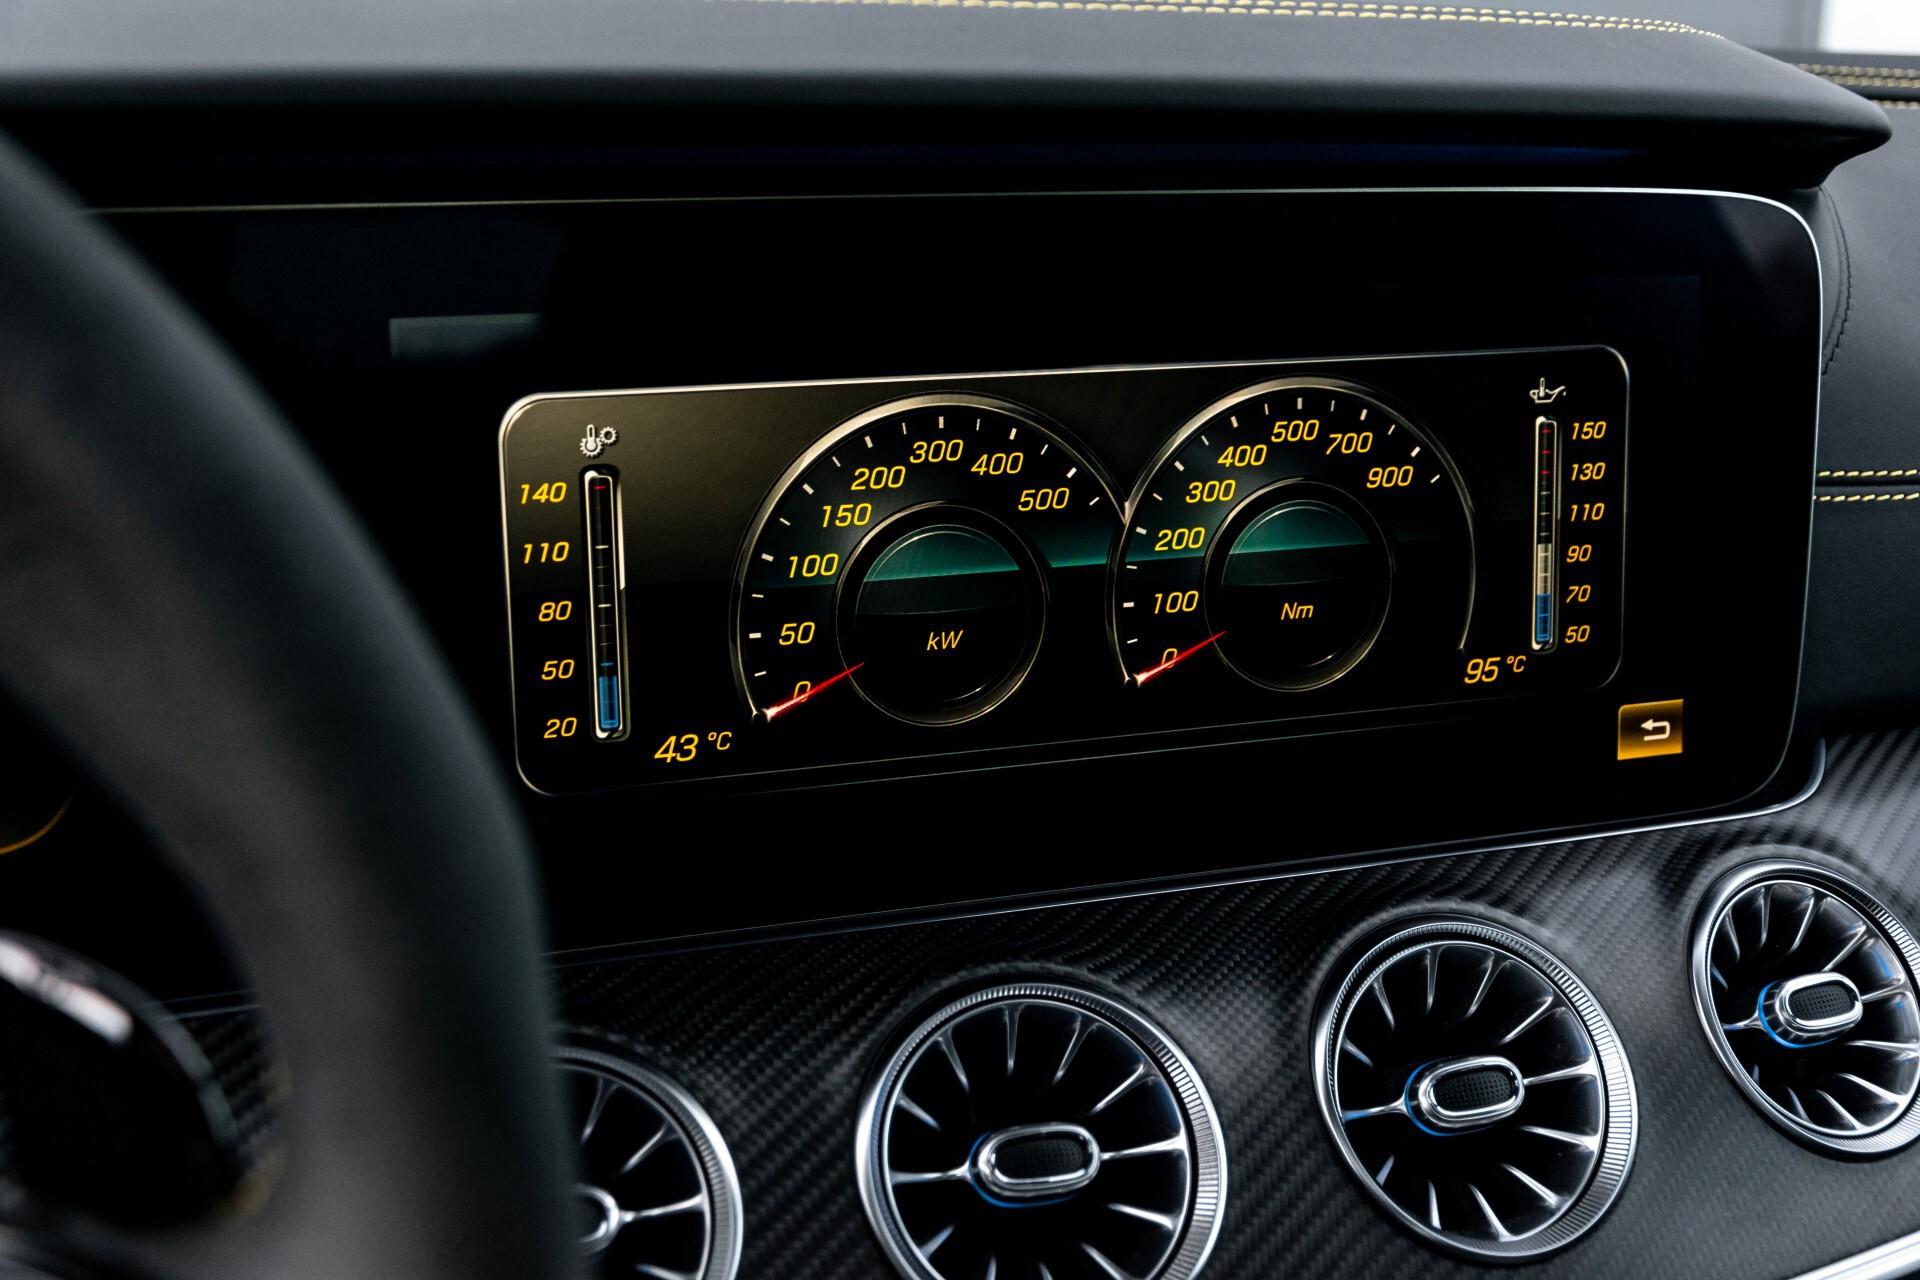 Mercedes-Benz AMG GT 4-Door Coupe 63 S 4MATIC+ Edition 1 Keramisch/Carbon/First Class/Dynamic Plus/Burmester High End 3D Aut9 Foto 35